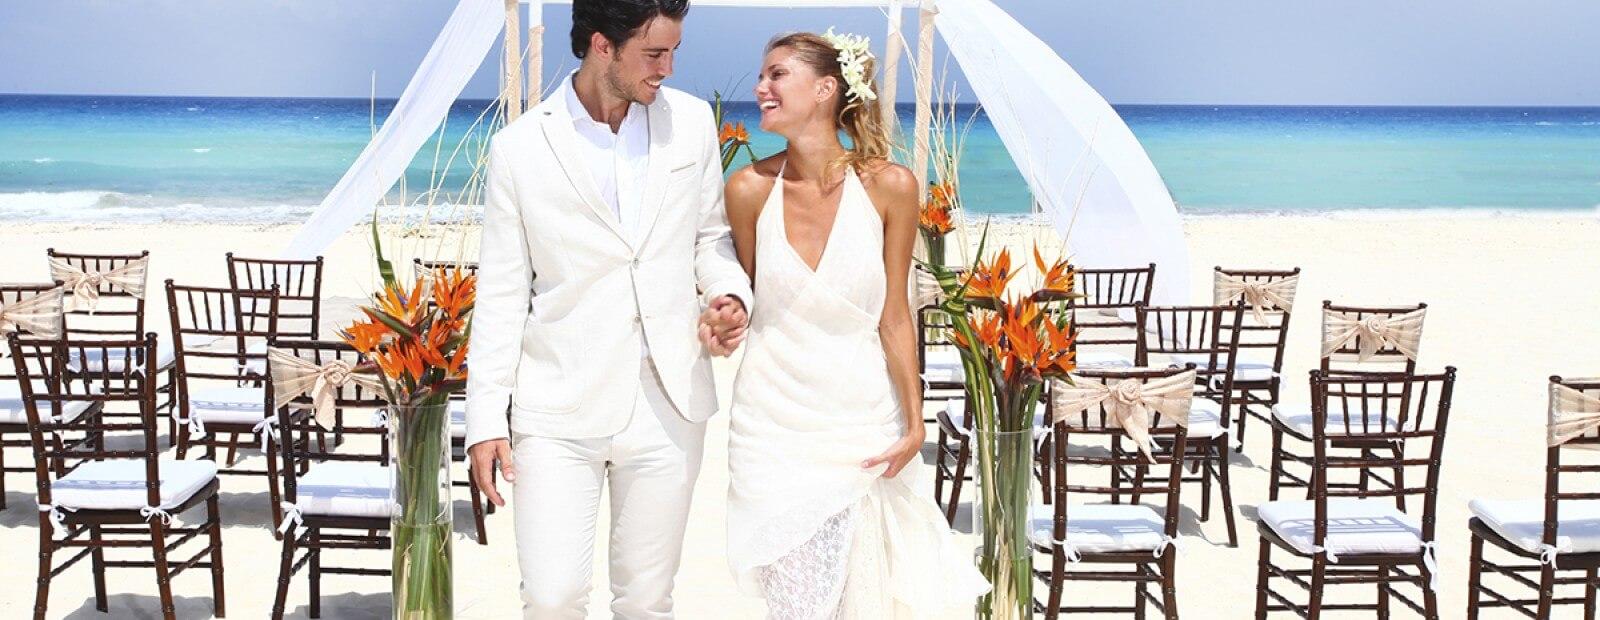 Weddings Cancun